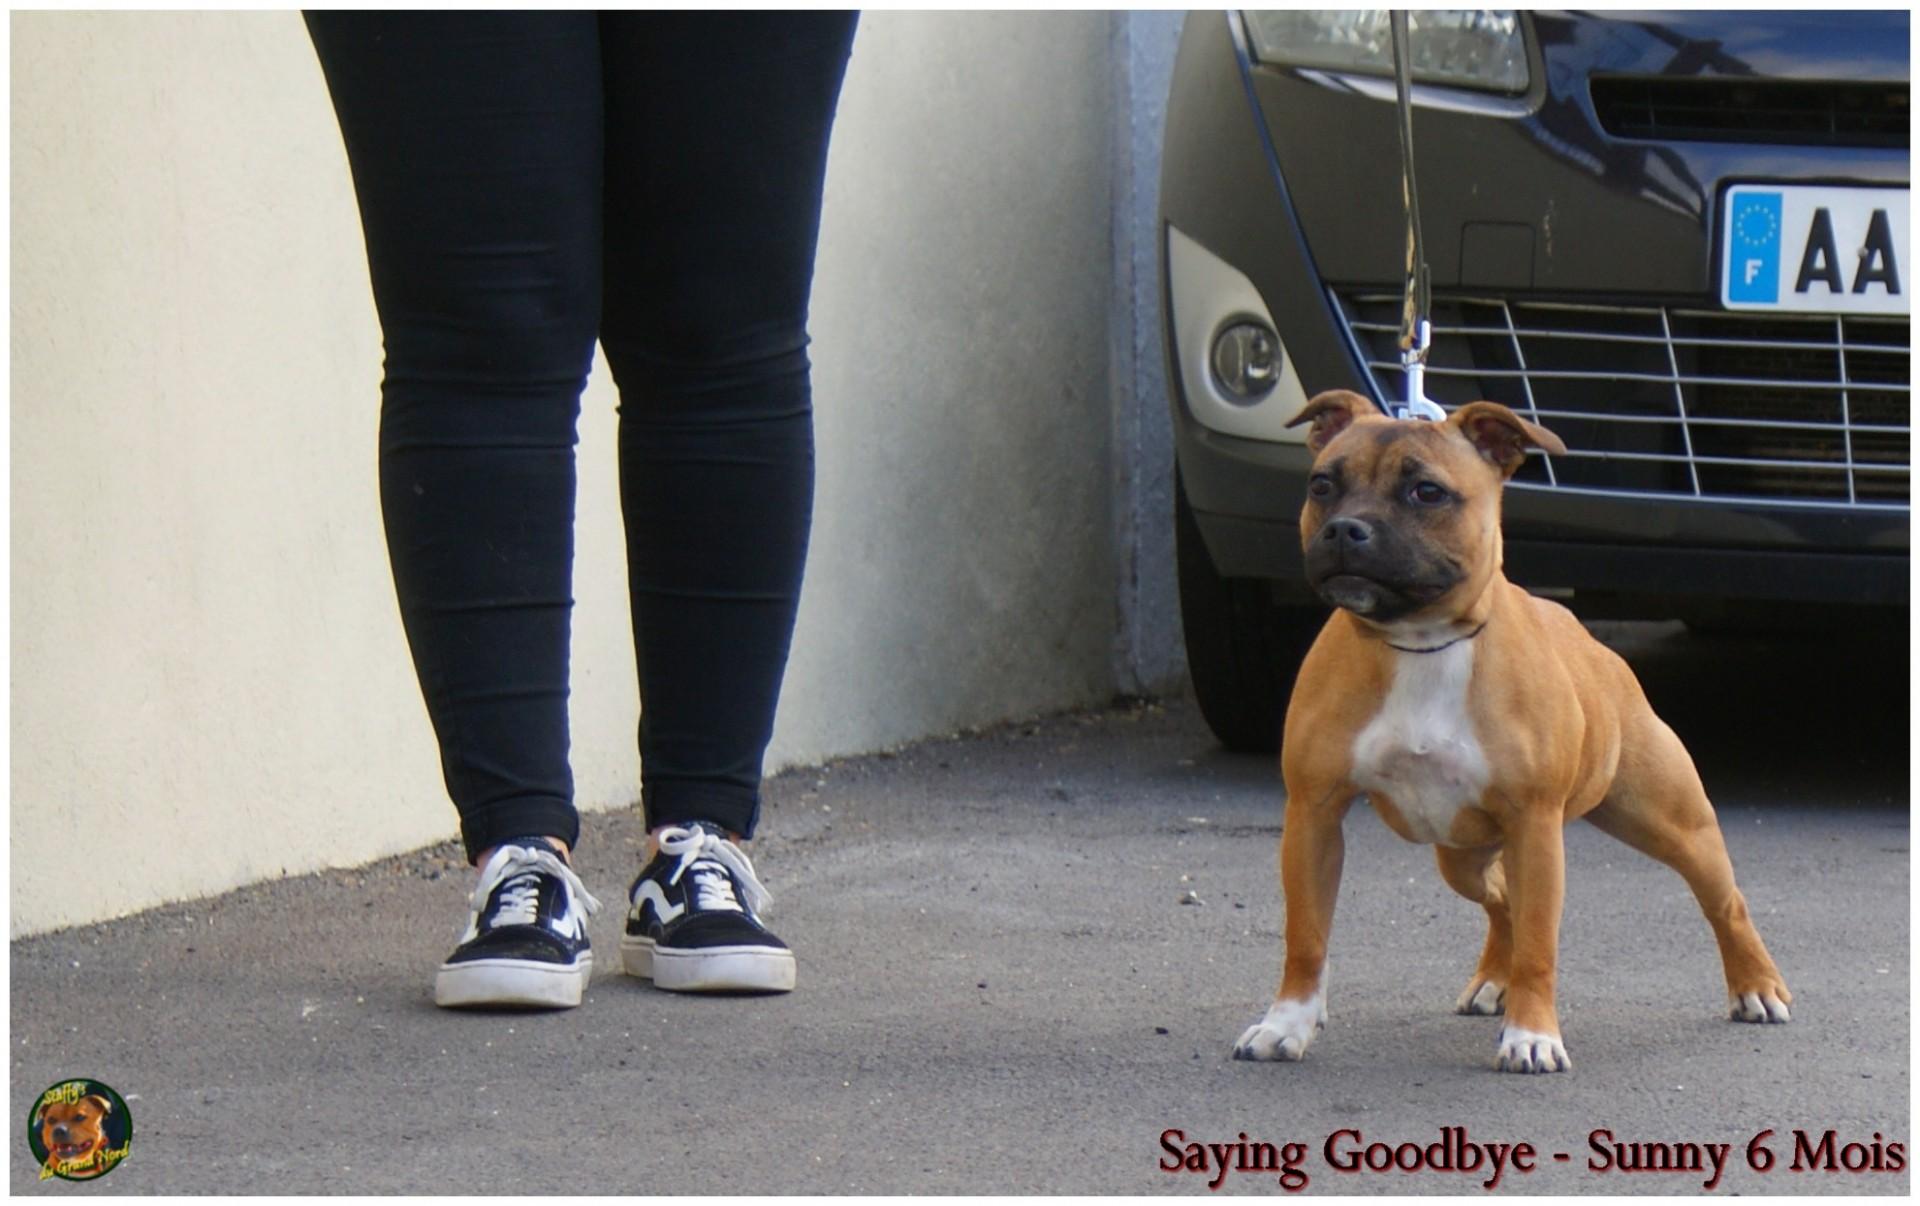 Saying Goddbye (Sunny)